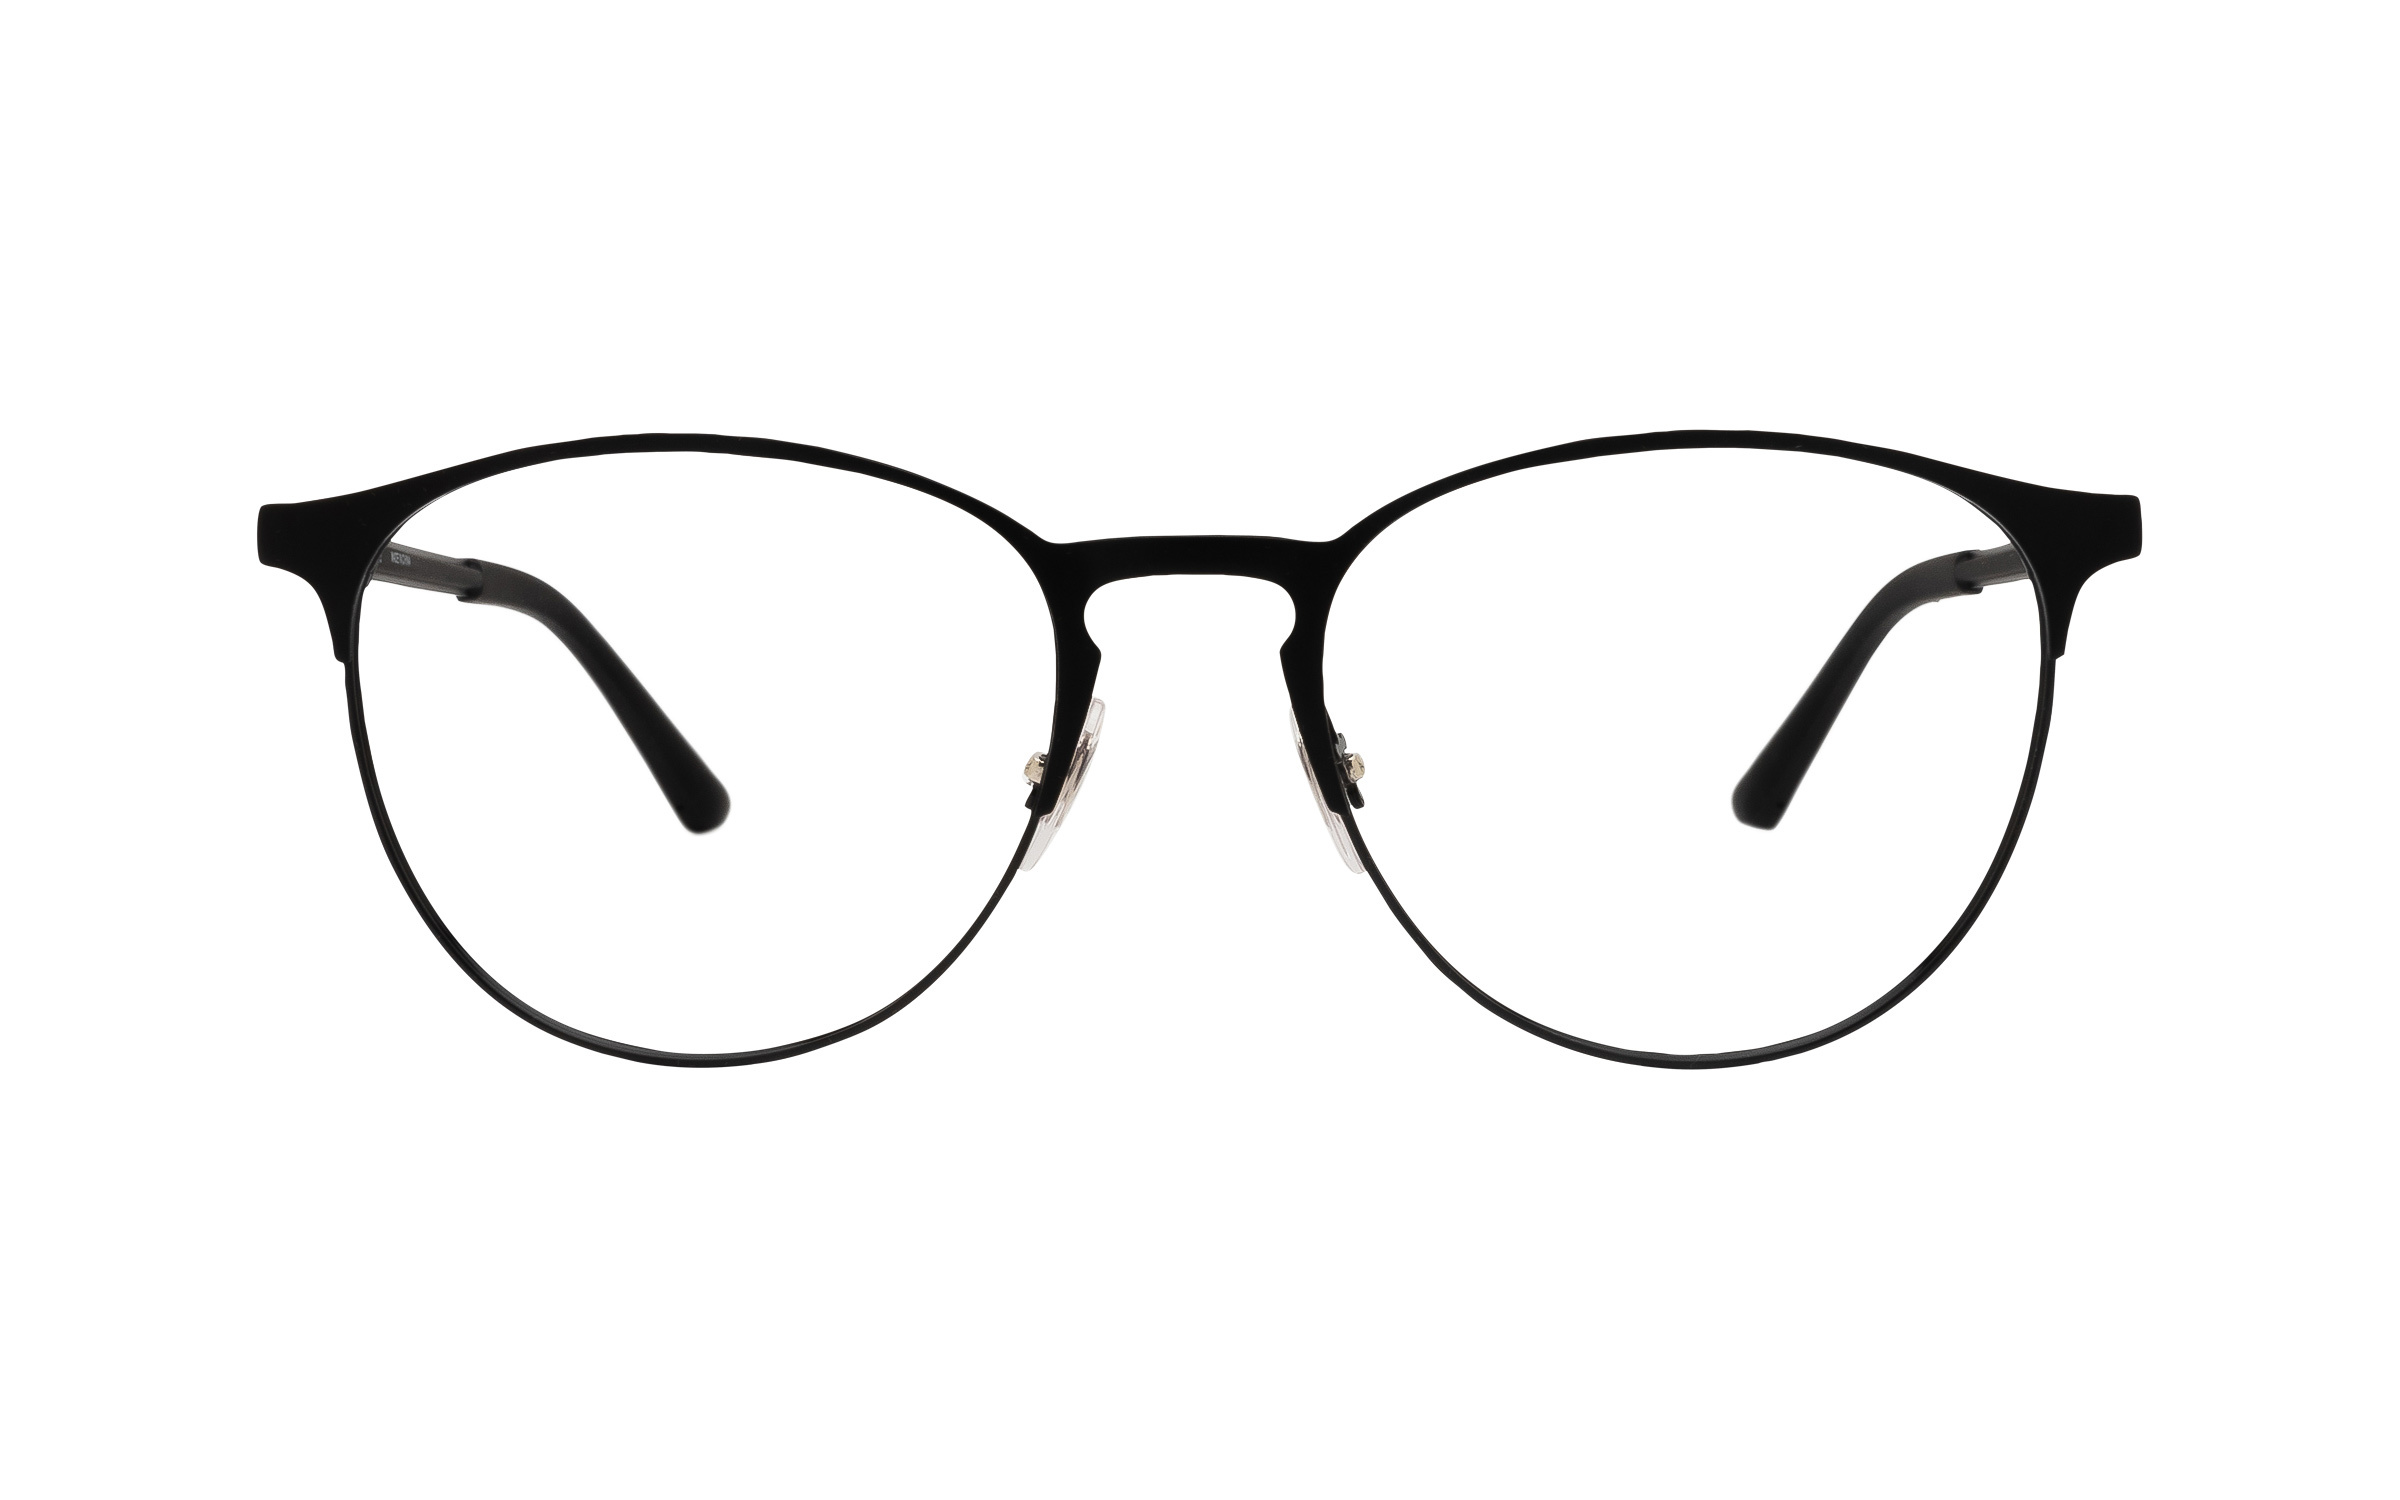 Ray-Ban RX6375 2944 (53) Eyeglasses and Frame in Matte Black | Acetate/Metal